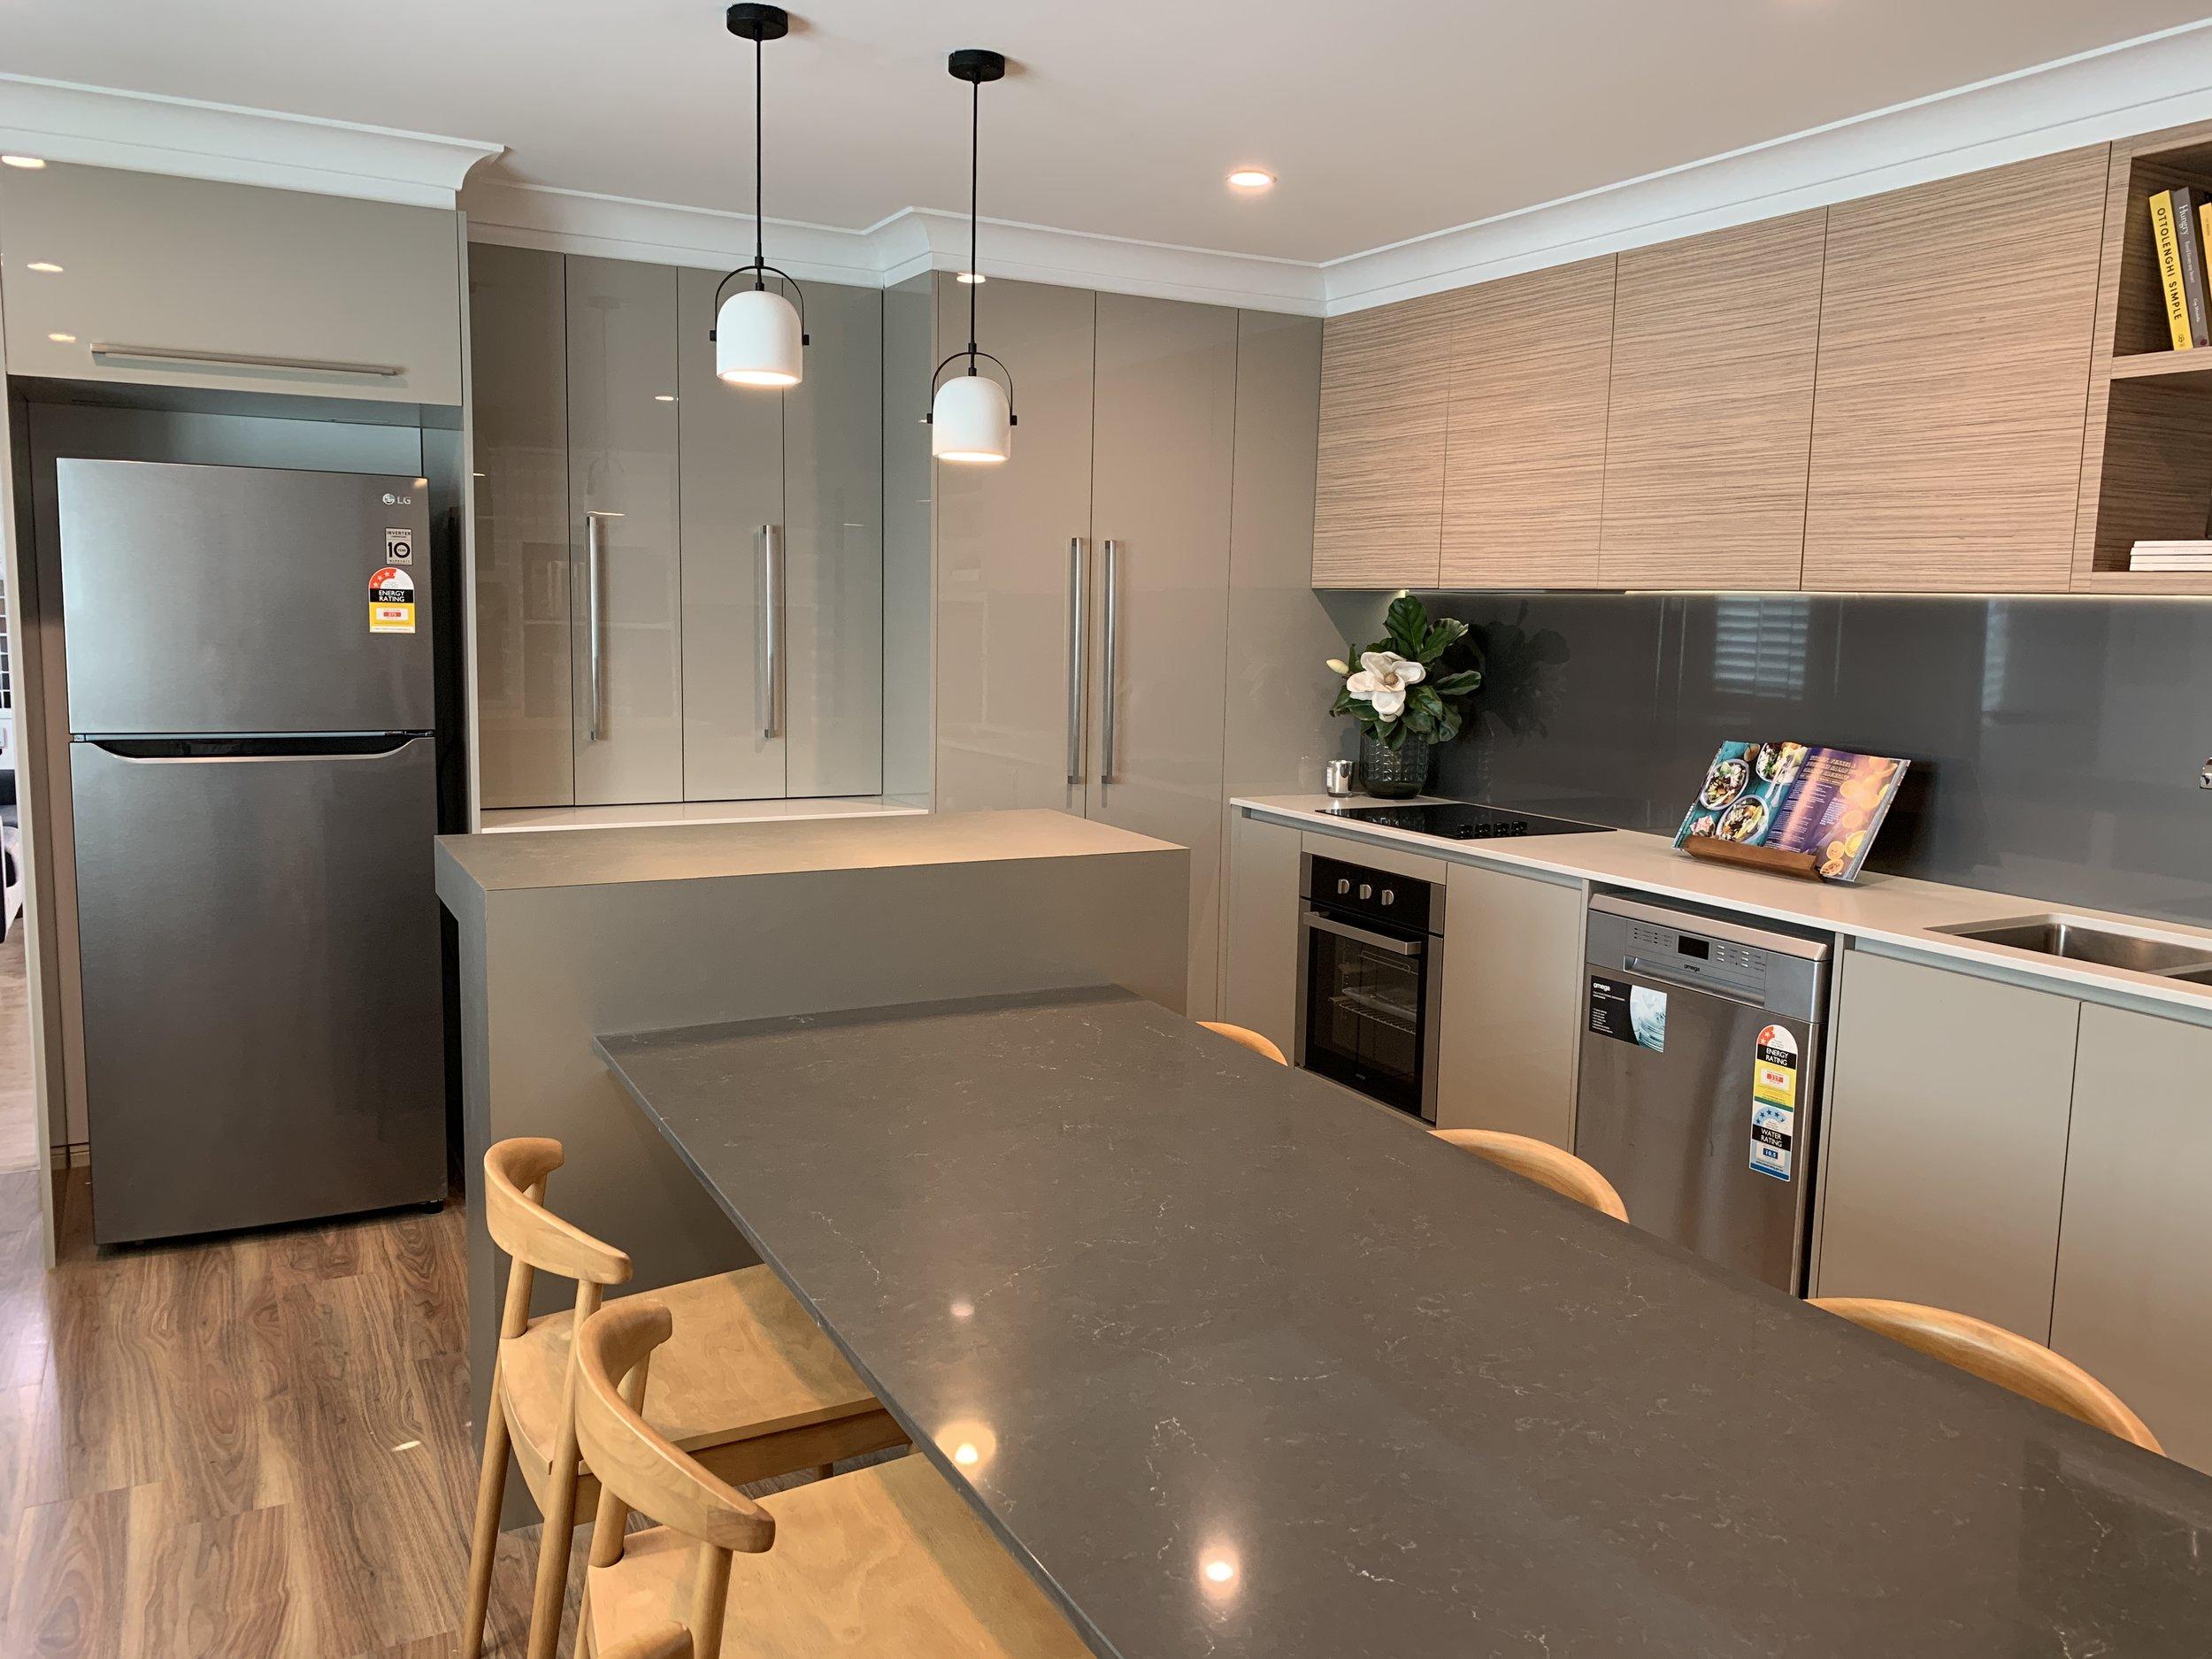 Kitchen - Bench Top: Caesarstone Fresh Concrete (20MM)Cupboards: Polytec Stone Grey CreatecOverheads: Polytec Satra Wood RavineSplashback: Laminex Metaline Nimbus